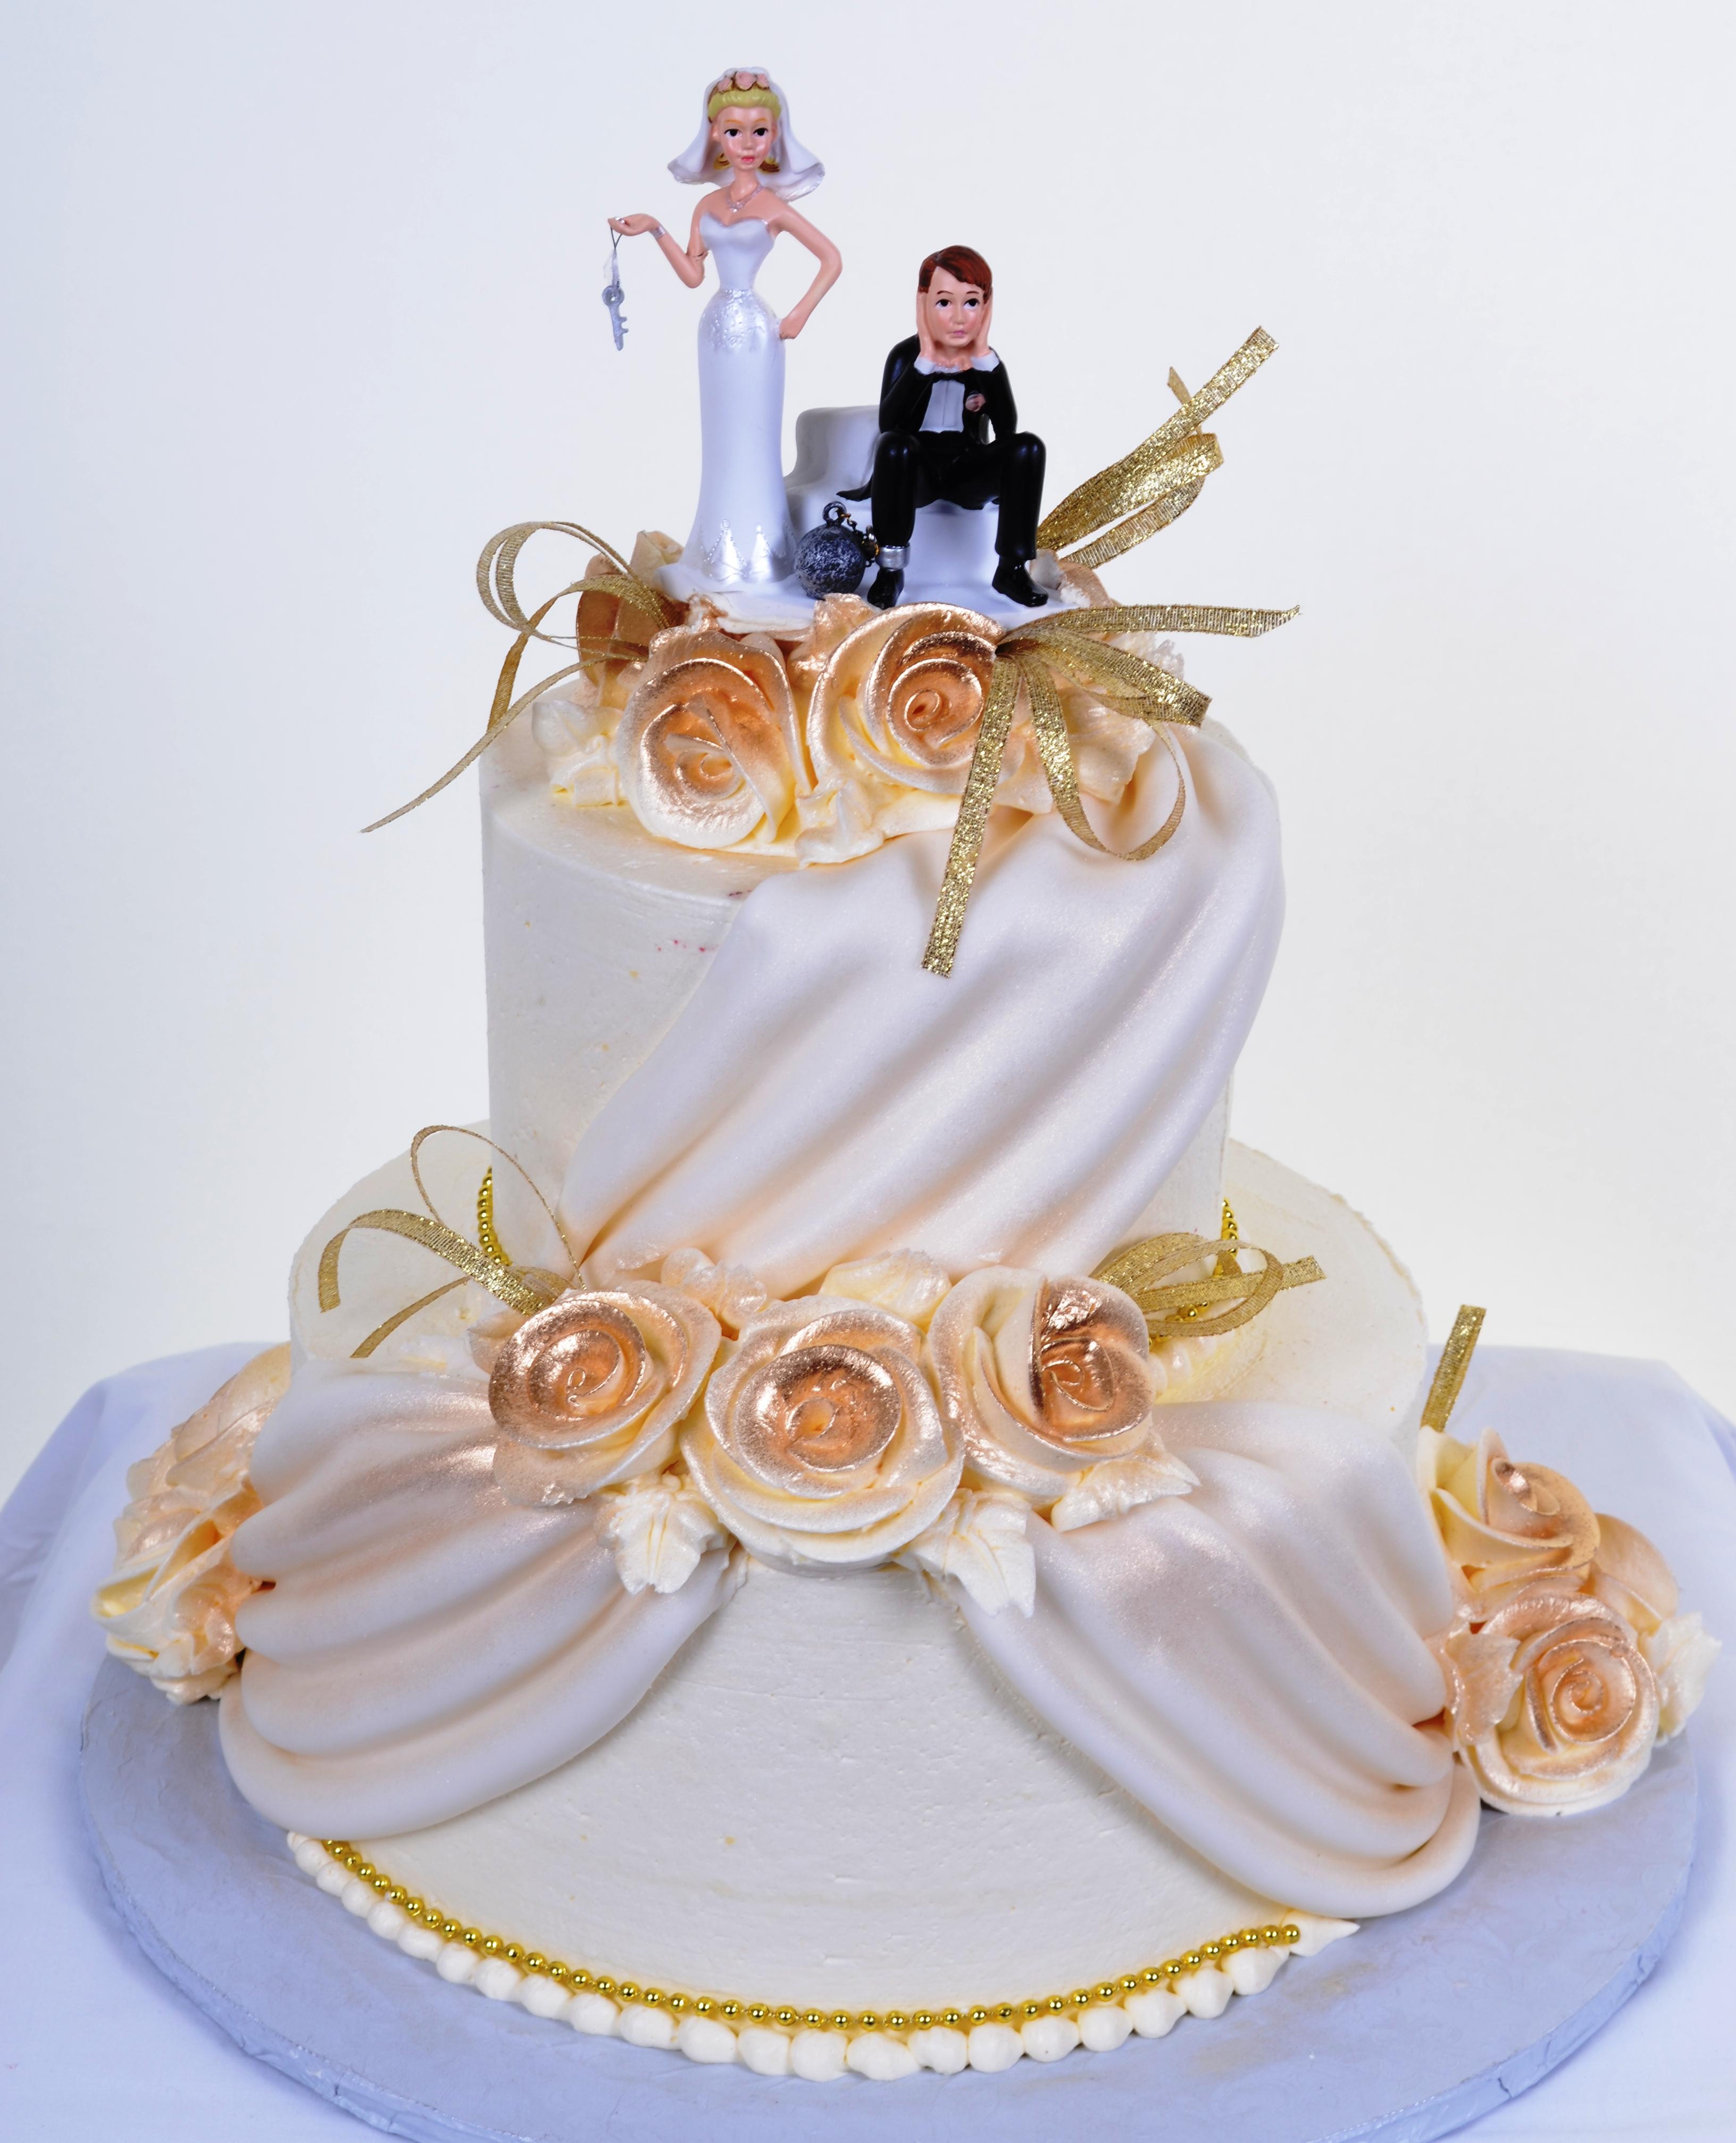 Pastry Palace Las Vegas - Wedding Cake 701 - Drapes & Roses